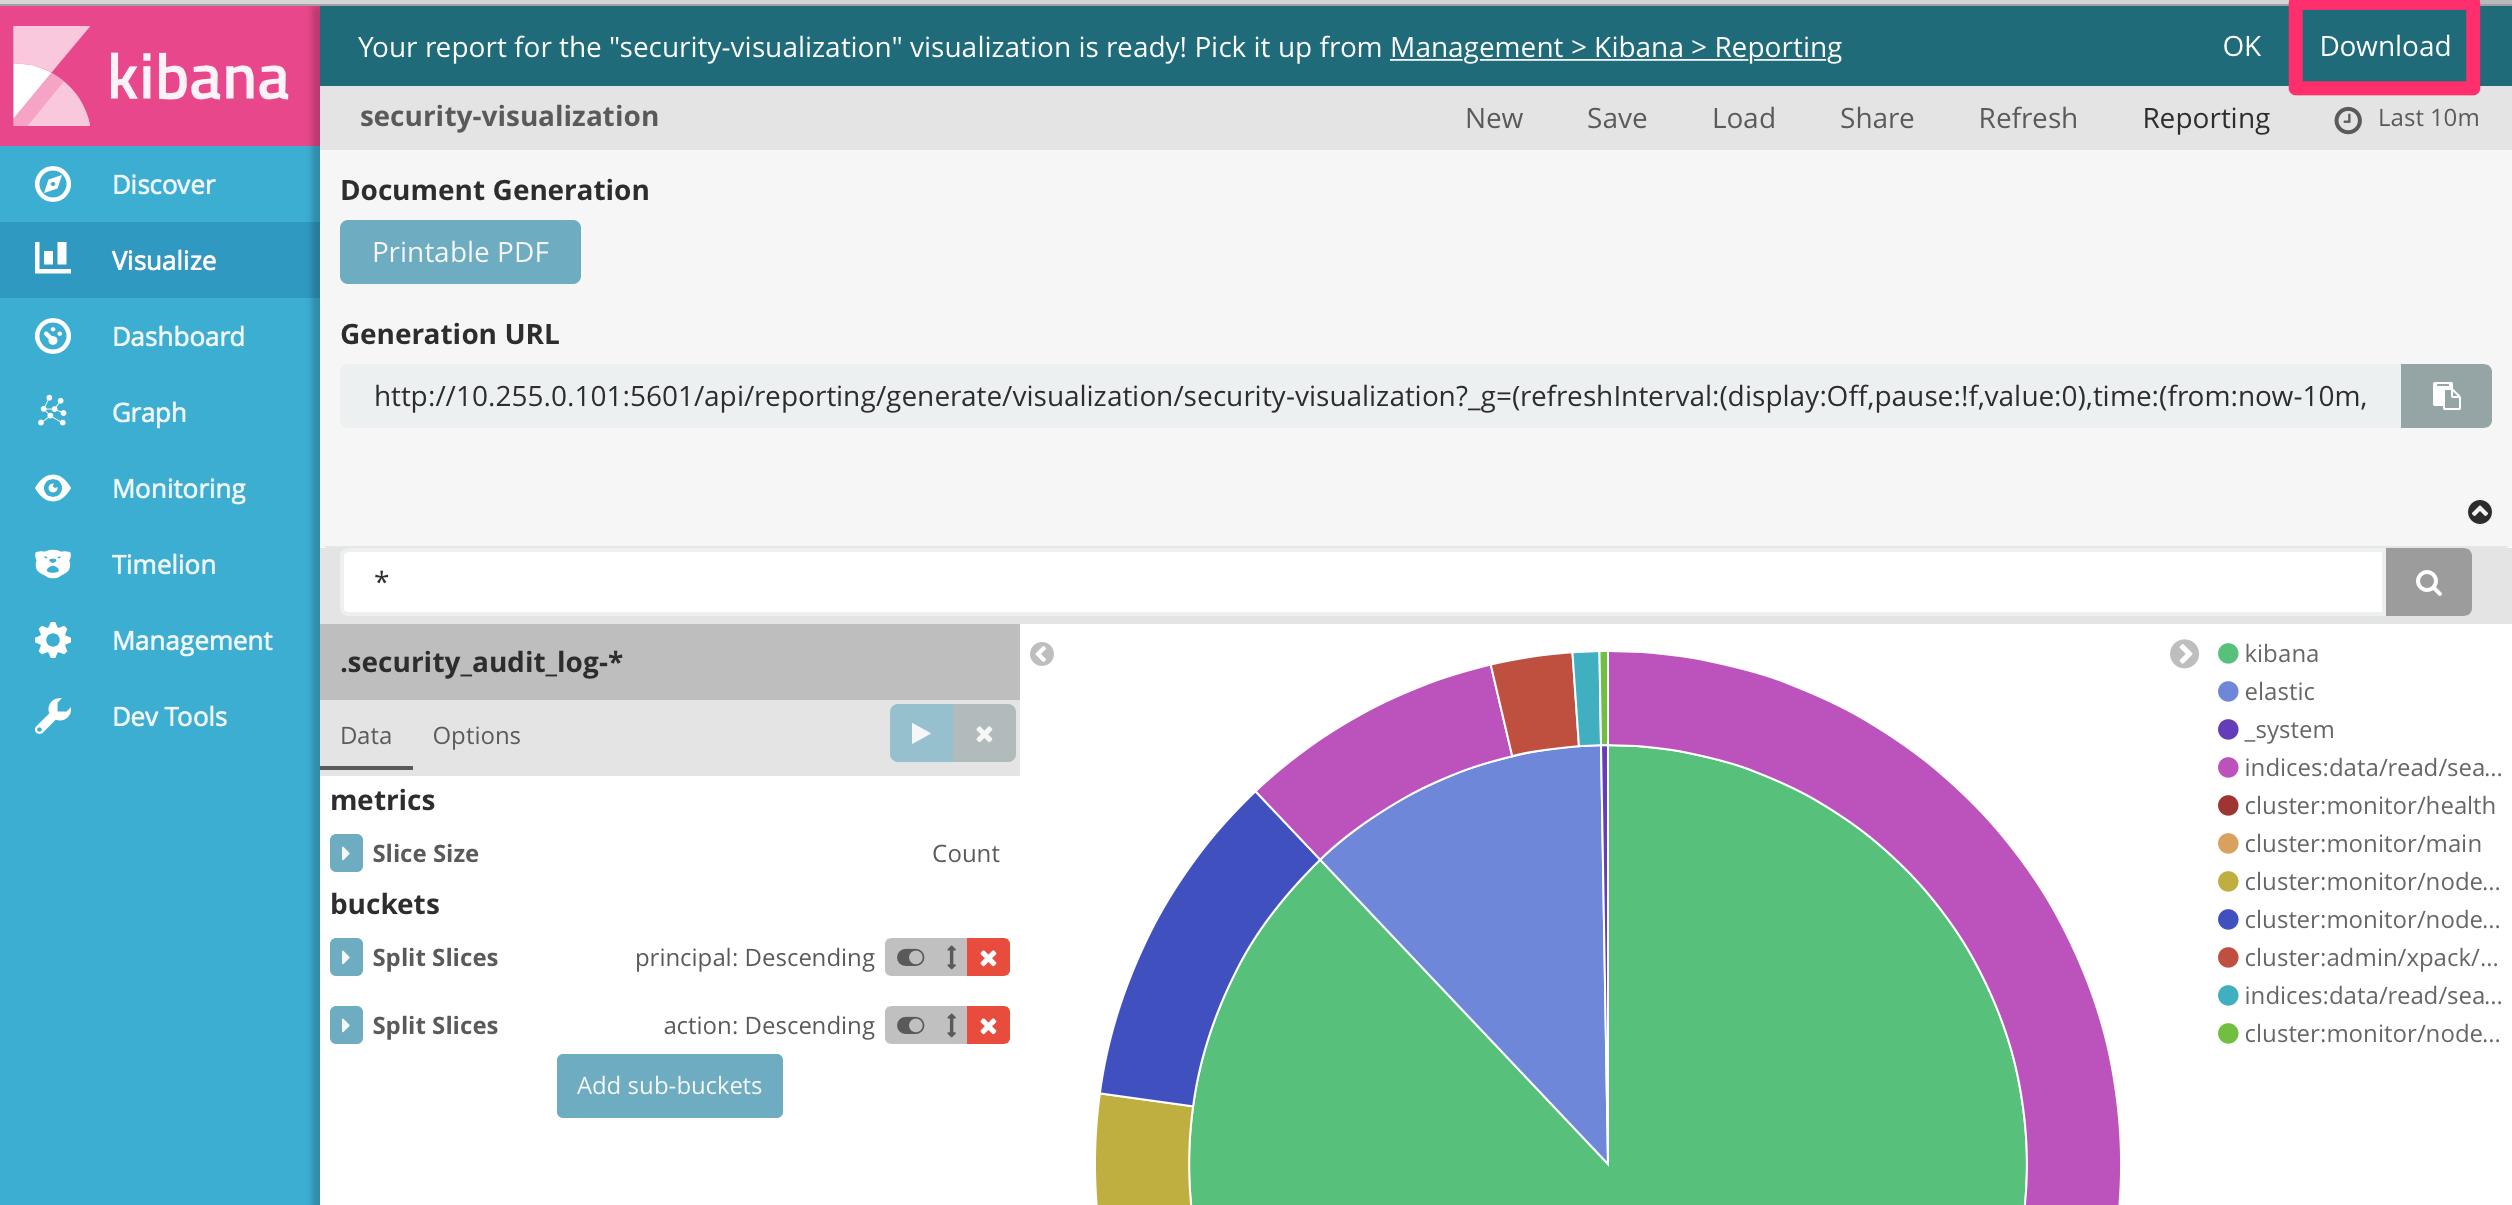 security-visualization_-_Kibana 4